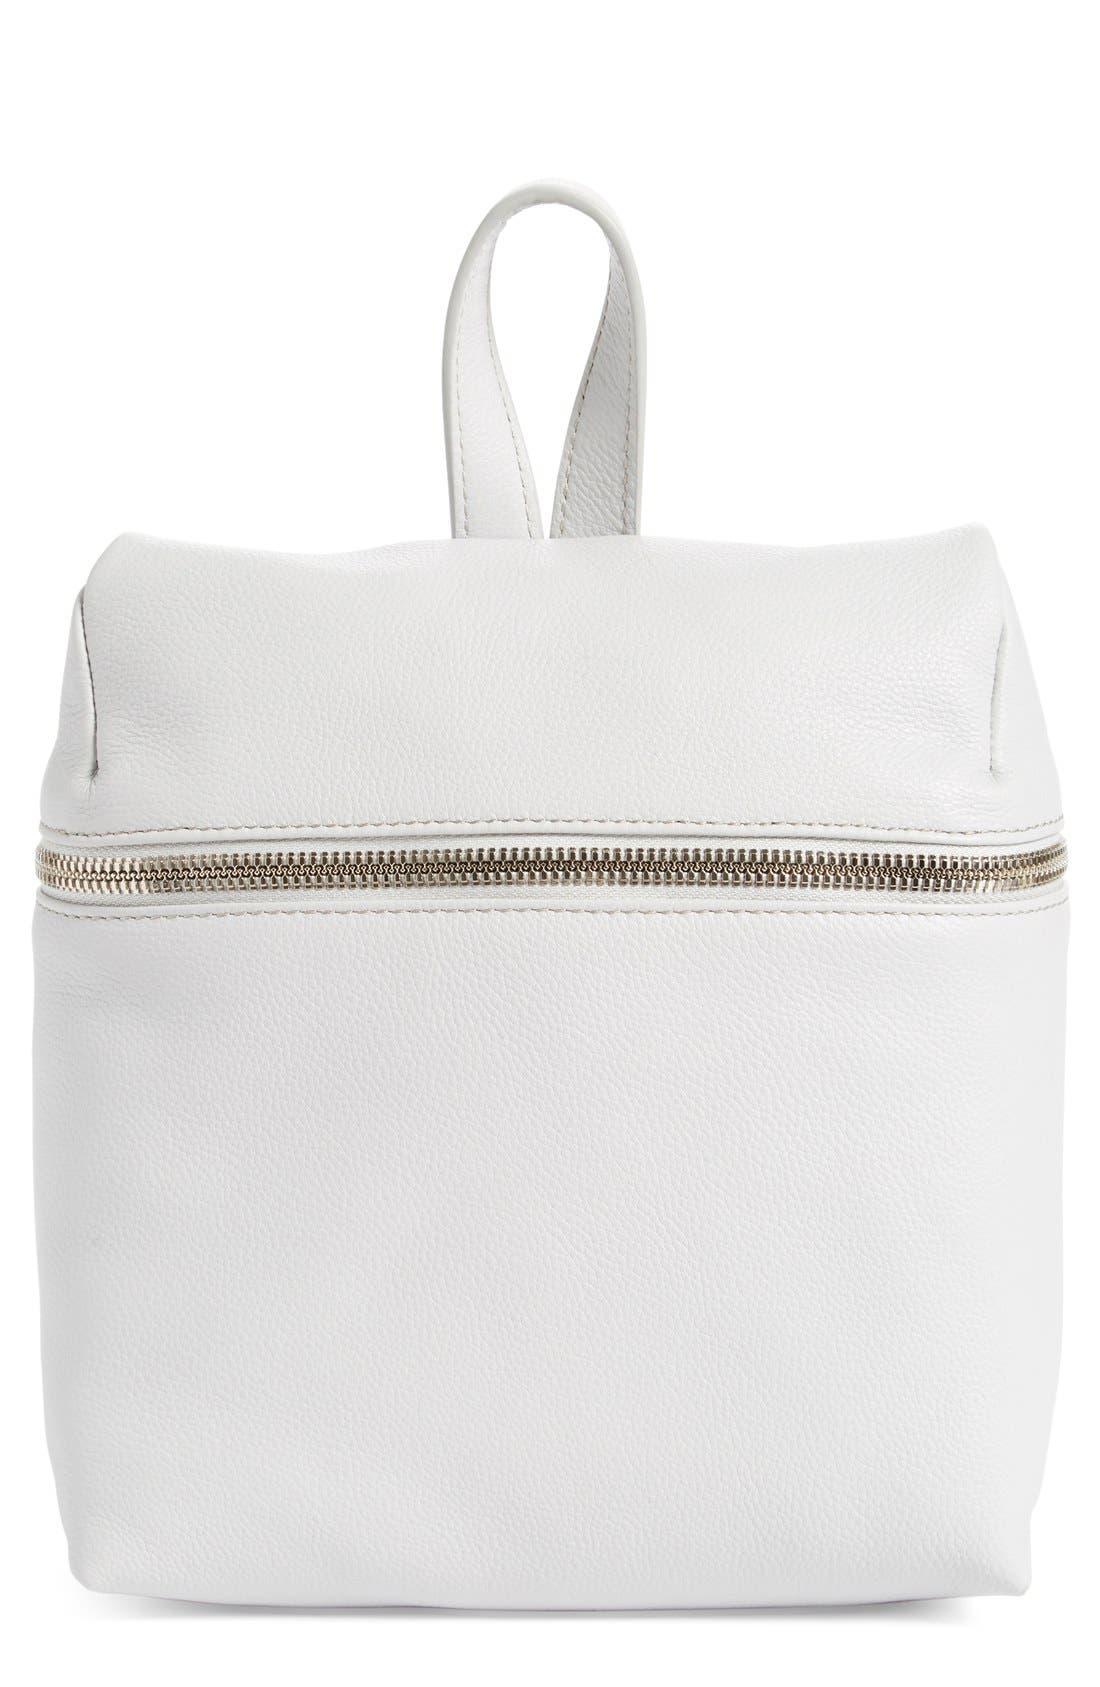 Alternate Image 1 Selected - KARA Small Pebbled Leather Backpack